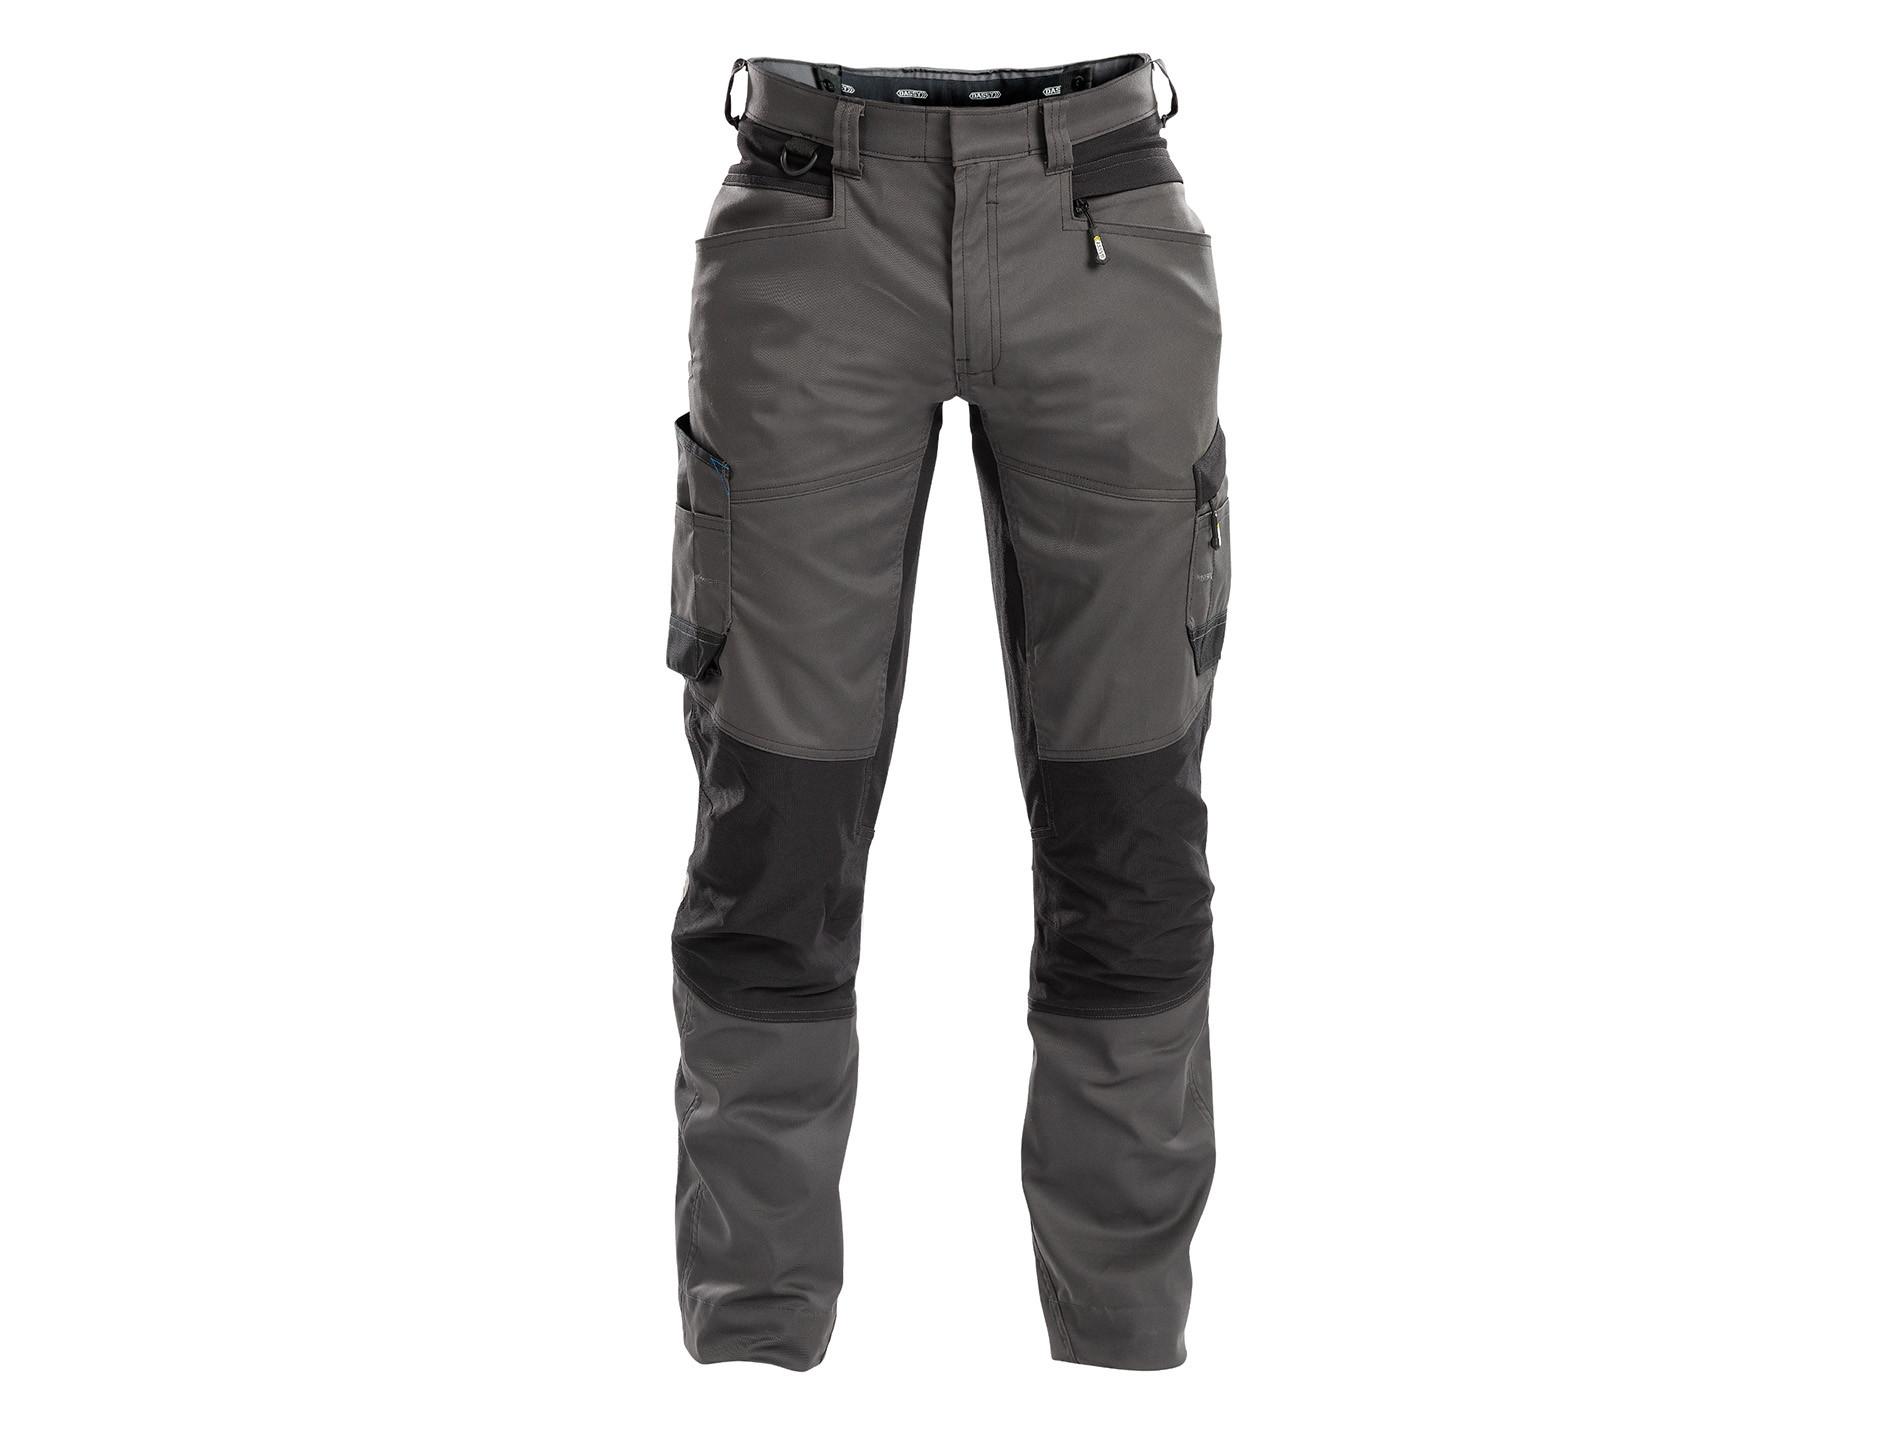 Sheego Bermuda Pantalon carpihose noir avec taille élastique NEUF 563